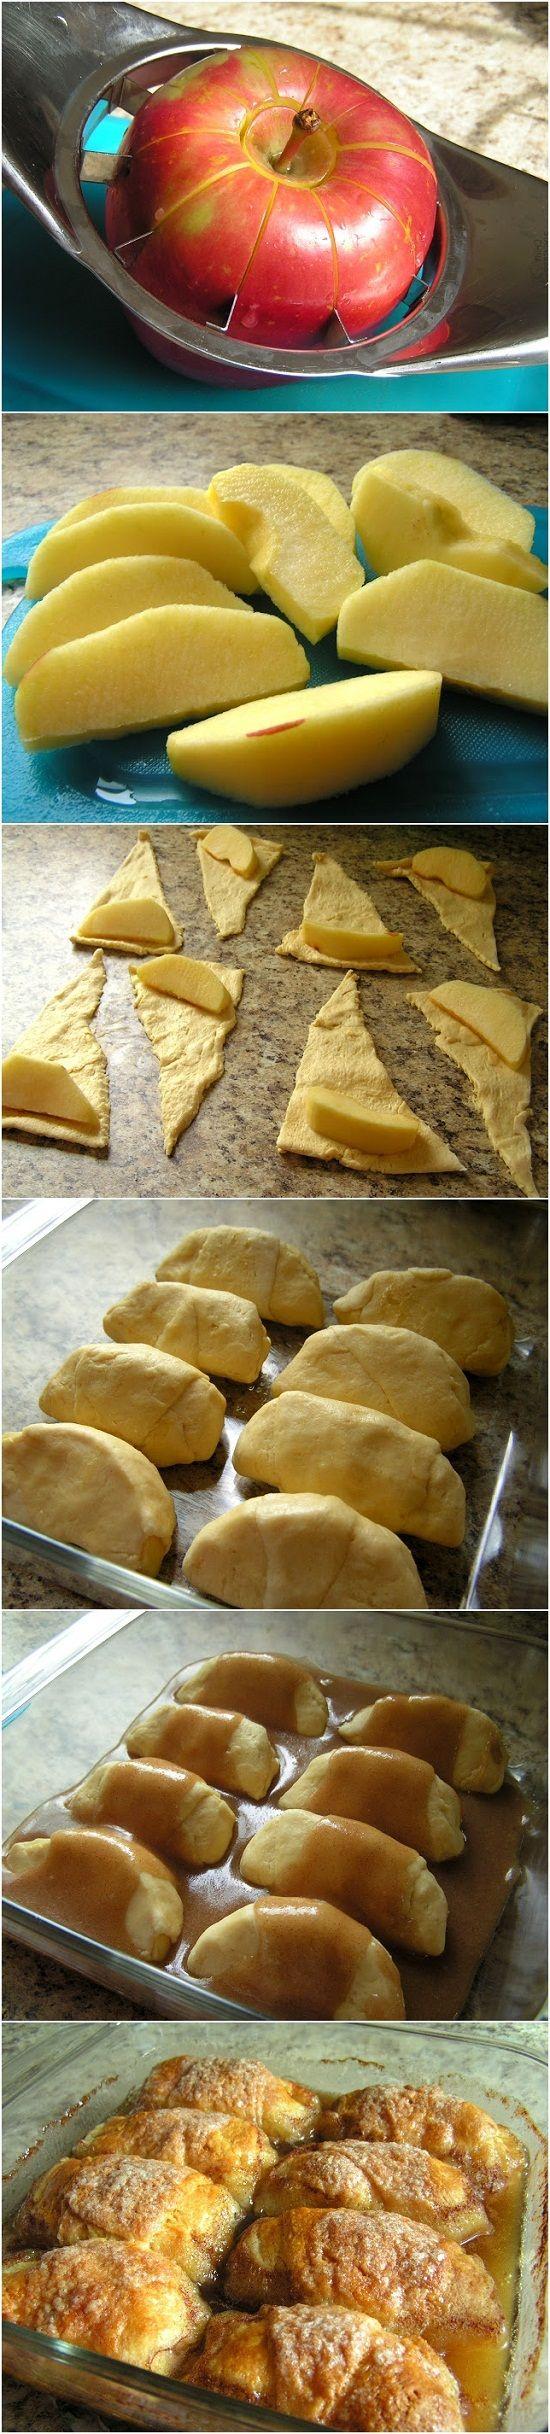 Country Apple Dumplings Recipe